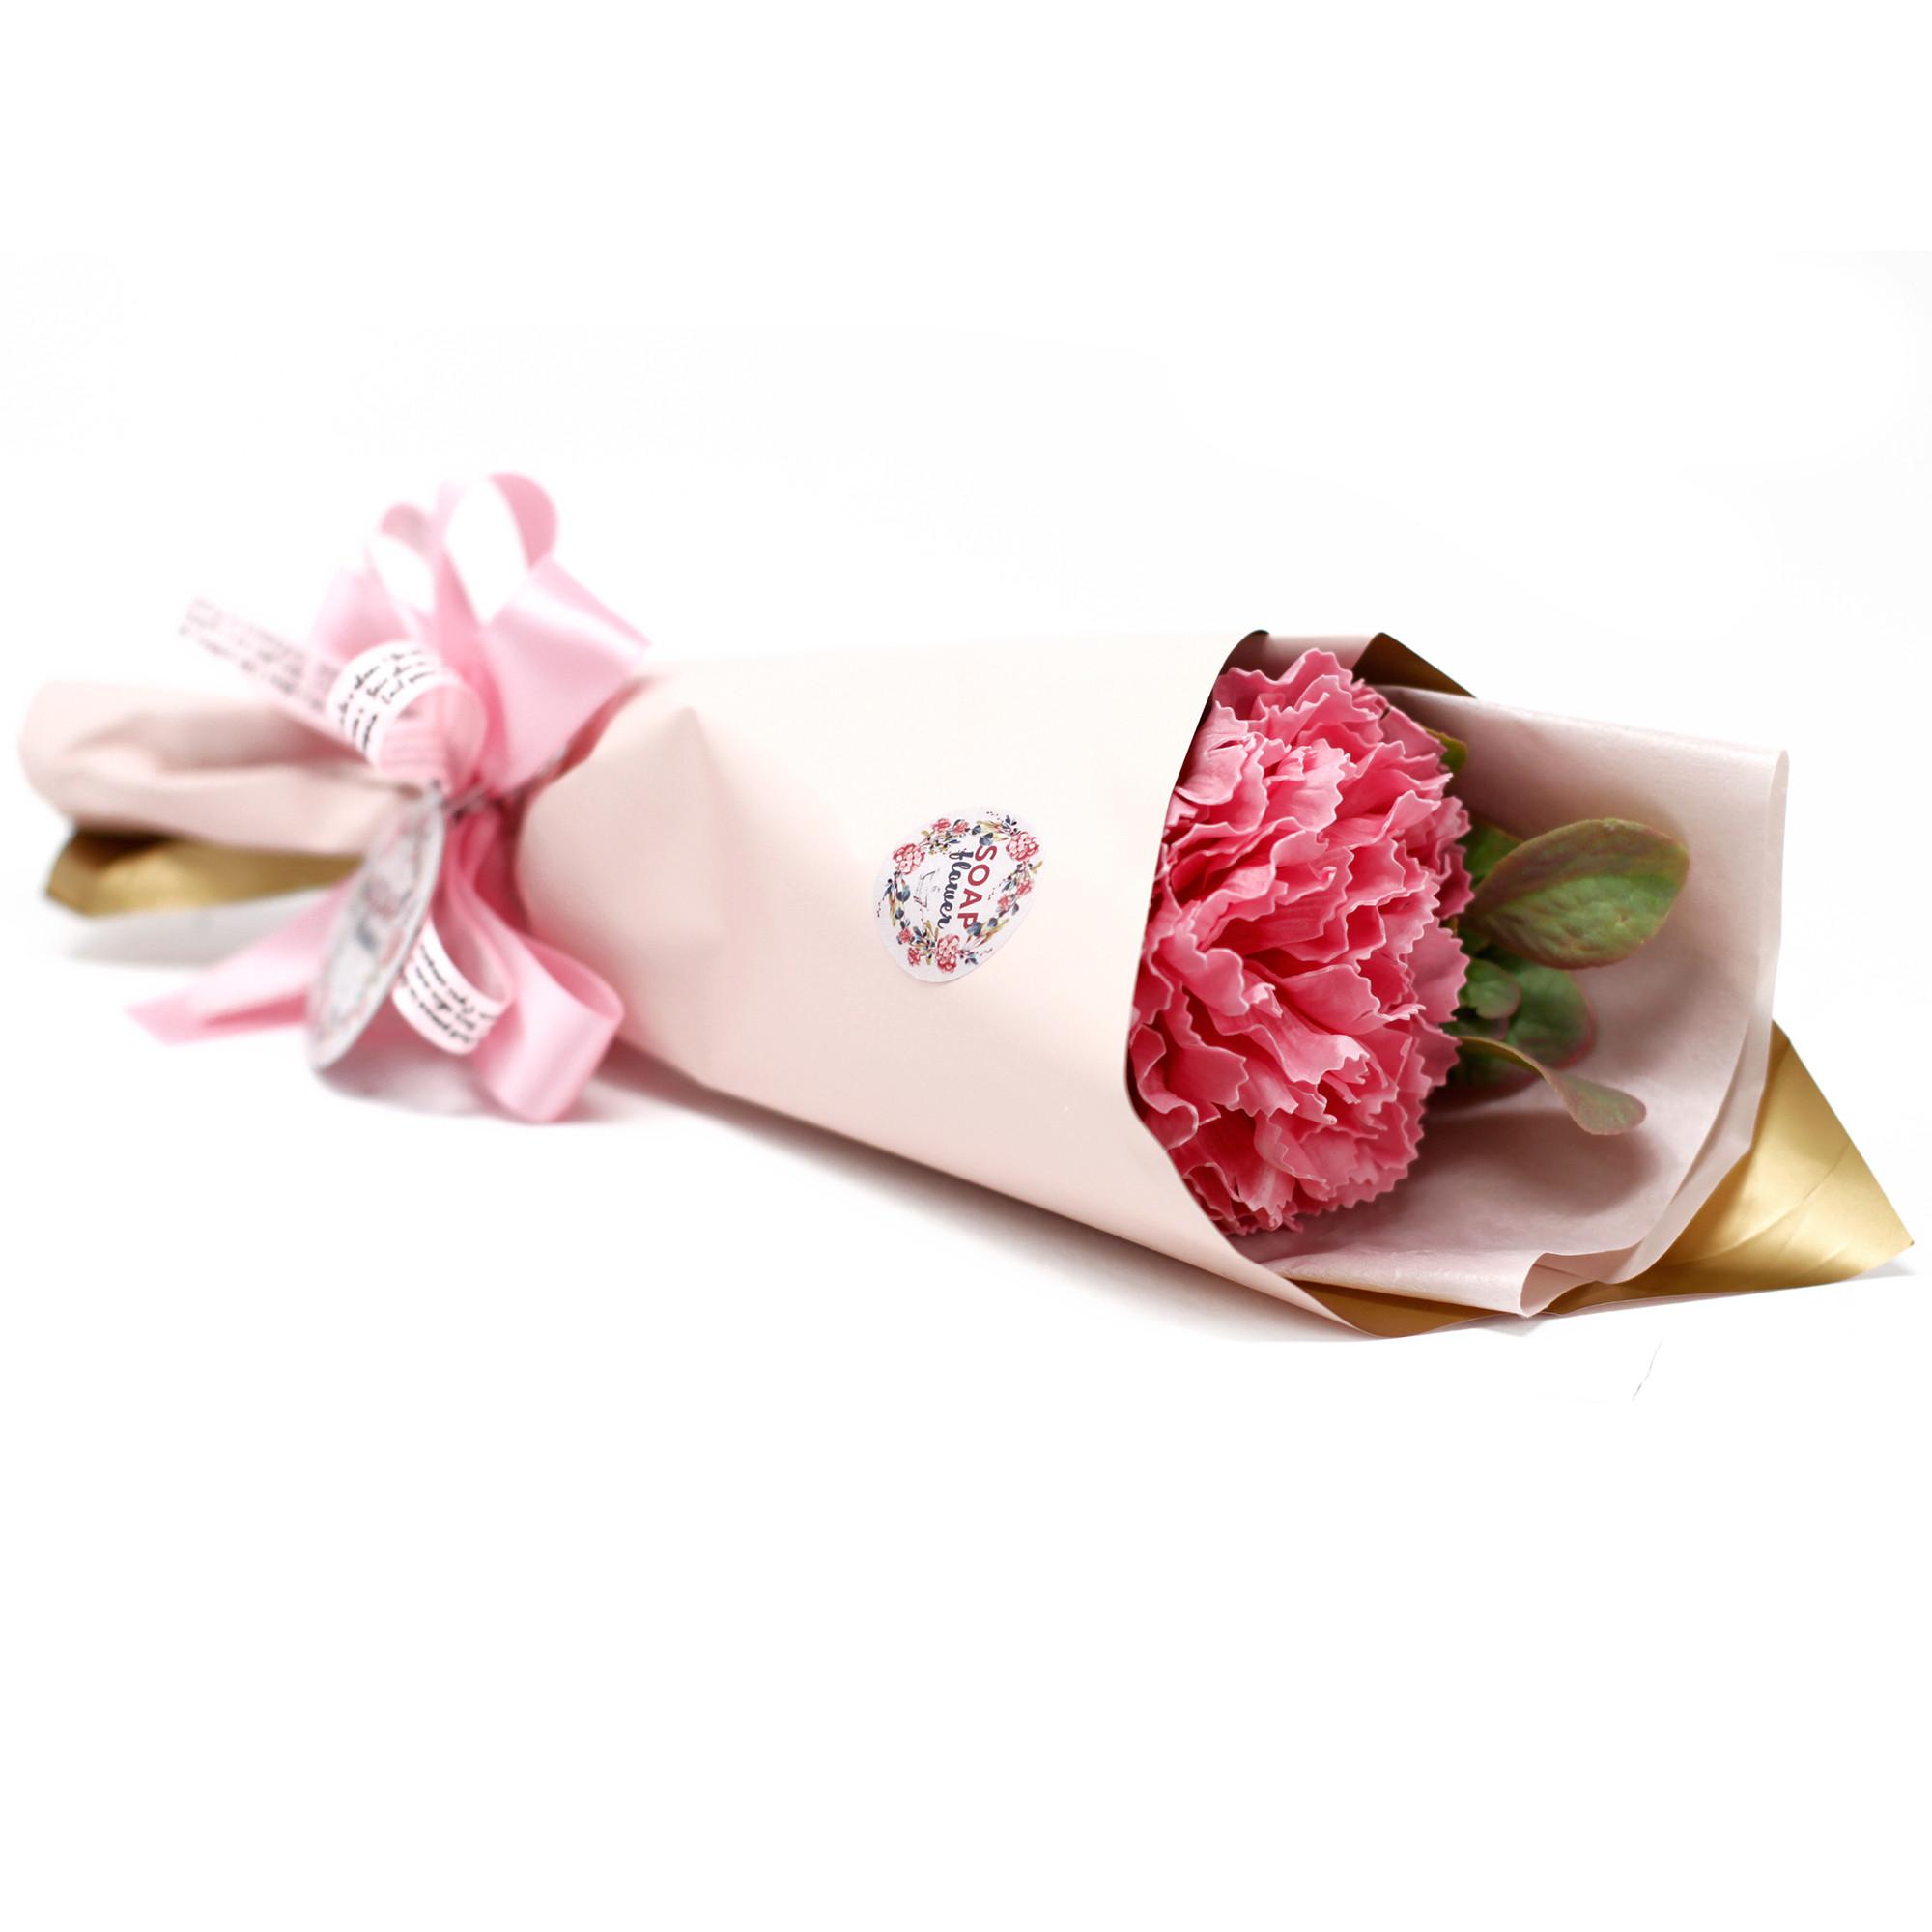 Soap Flower Carnation Bouquet